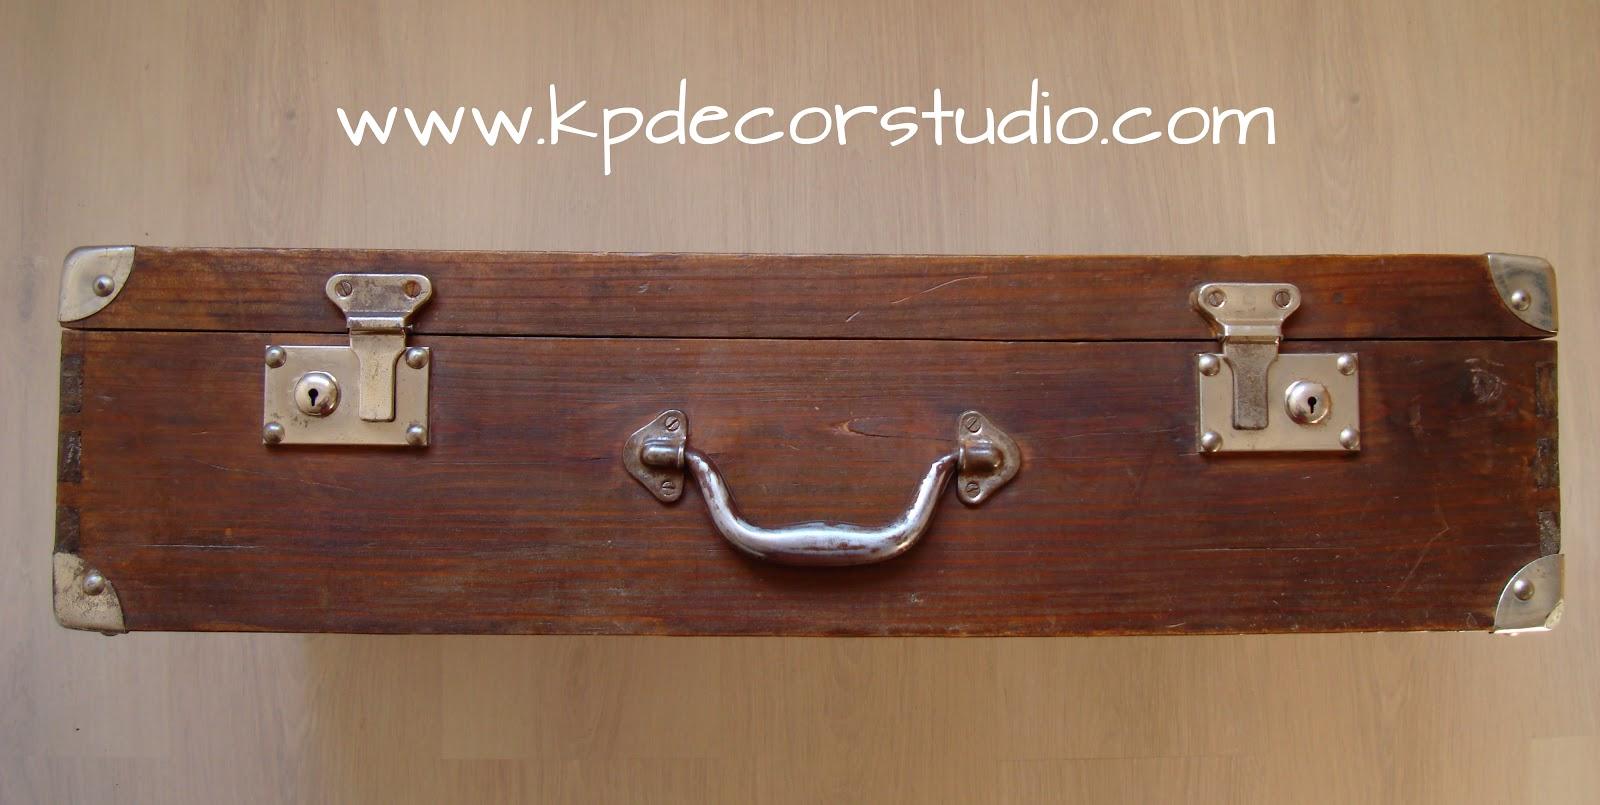 Kp decor studio maleta de madera antigua old wooden - Comprar decoracion vintage ...